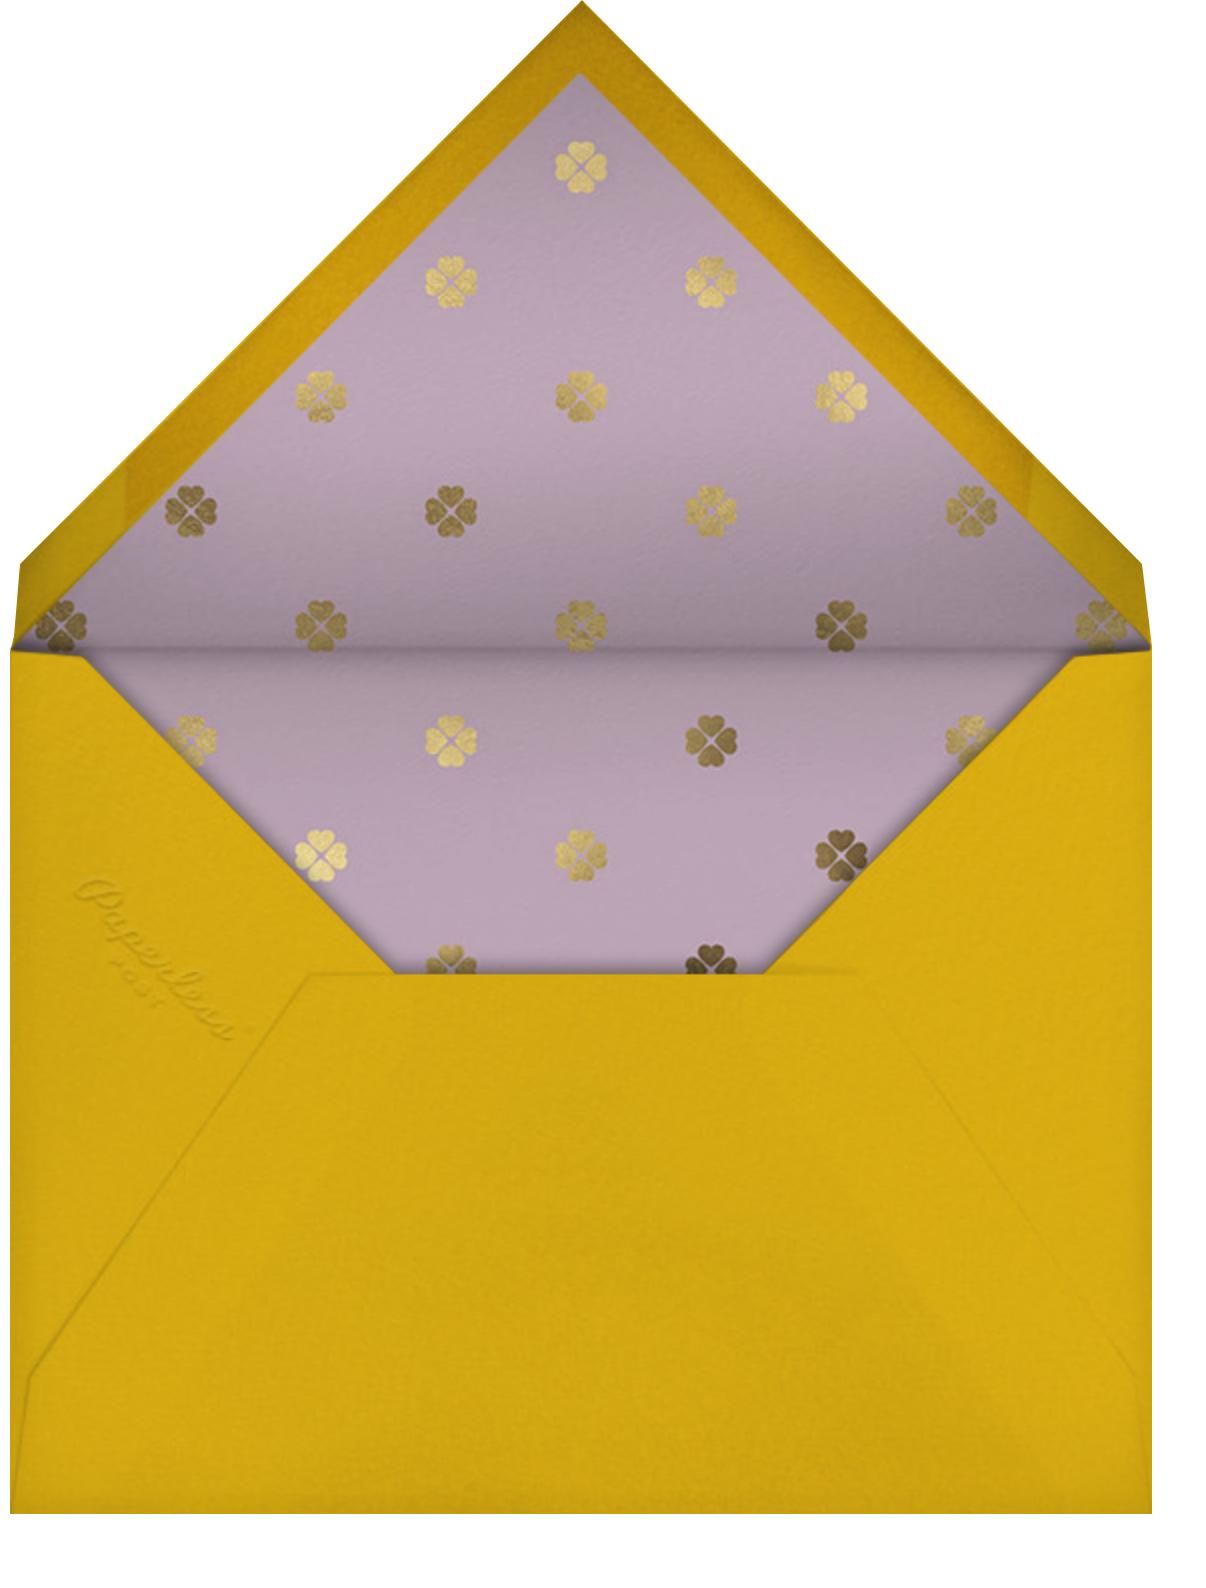 Swing Floral - kate spade new york - Graduation thank you cards - envelope back